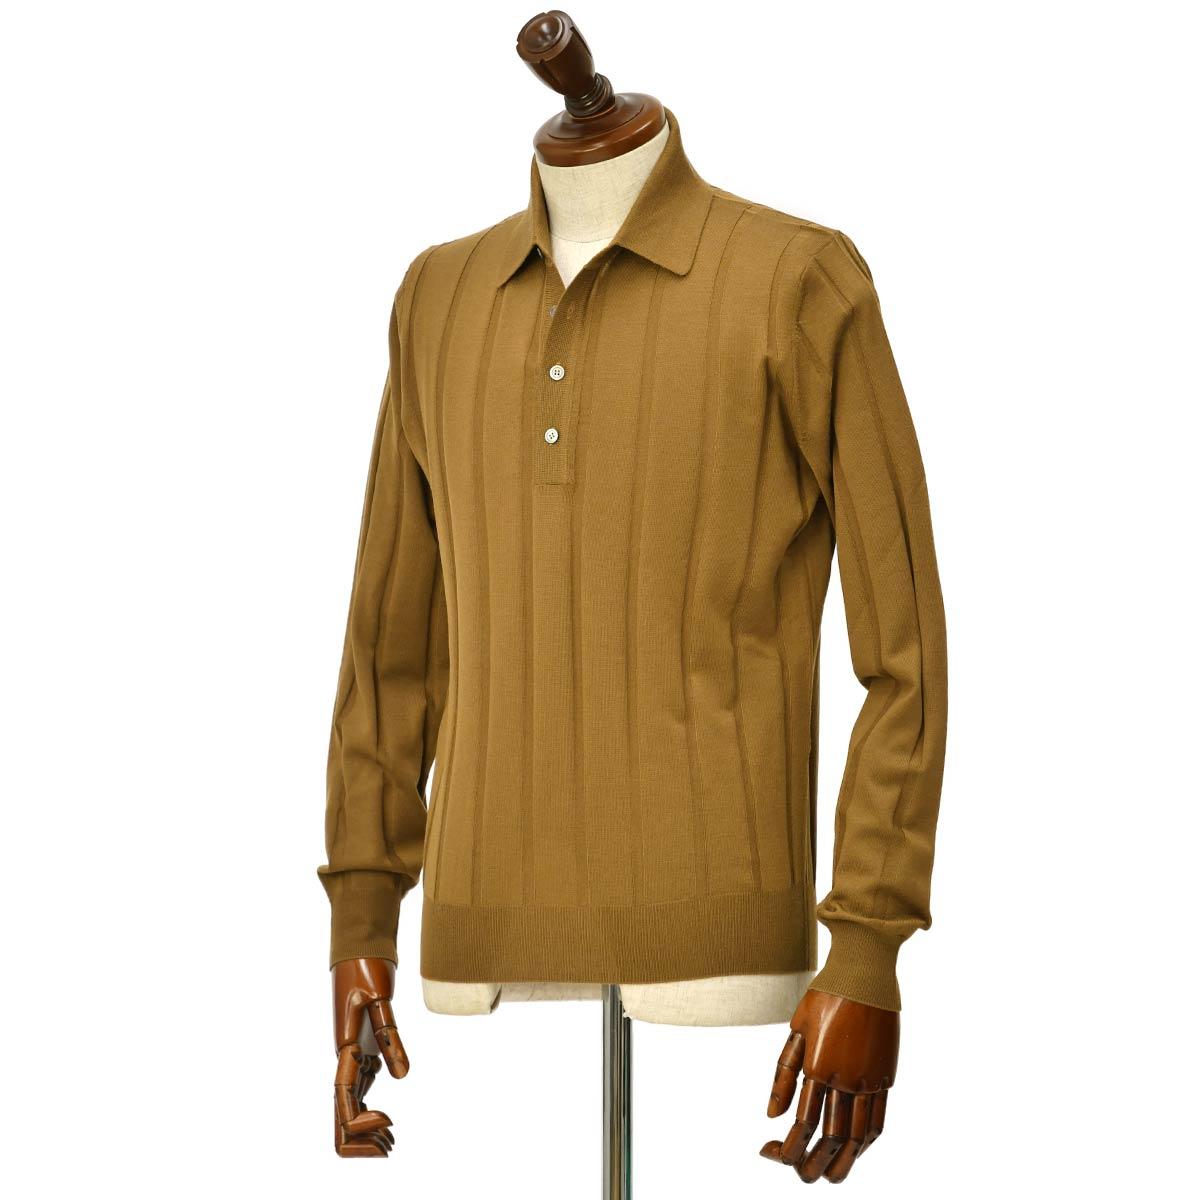 FILIPPO DE LAURENTIIS 【フィリッポ デ ローレンティス】ニットポロシャツ I27661 480 ウール キャメル